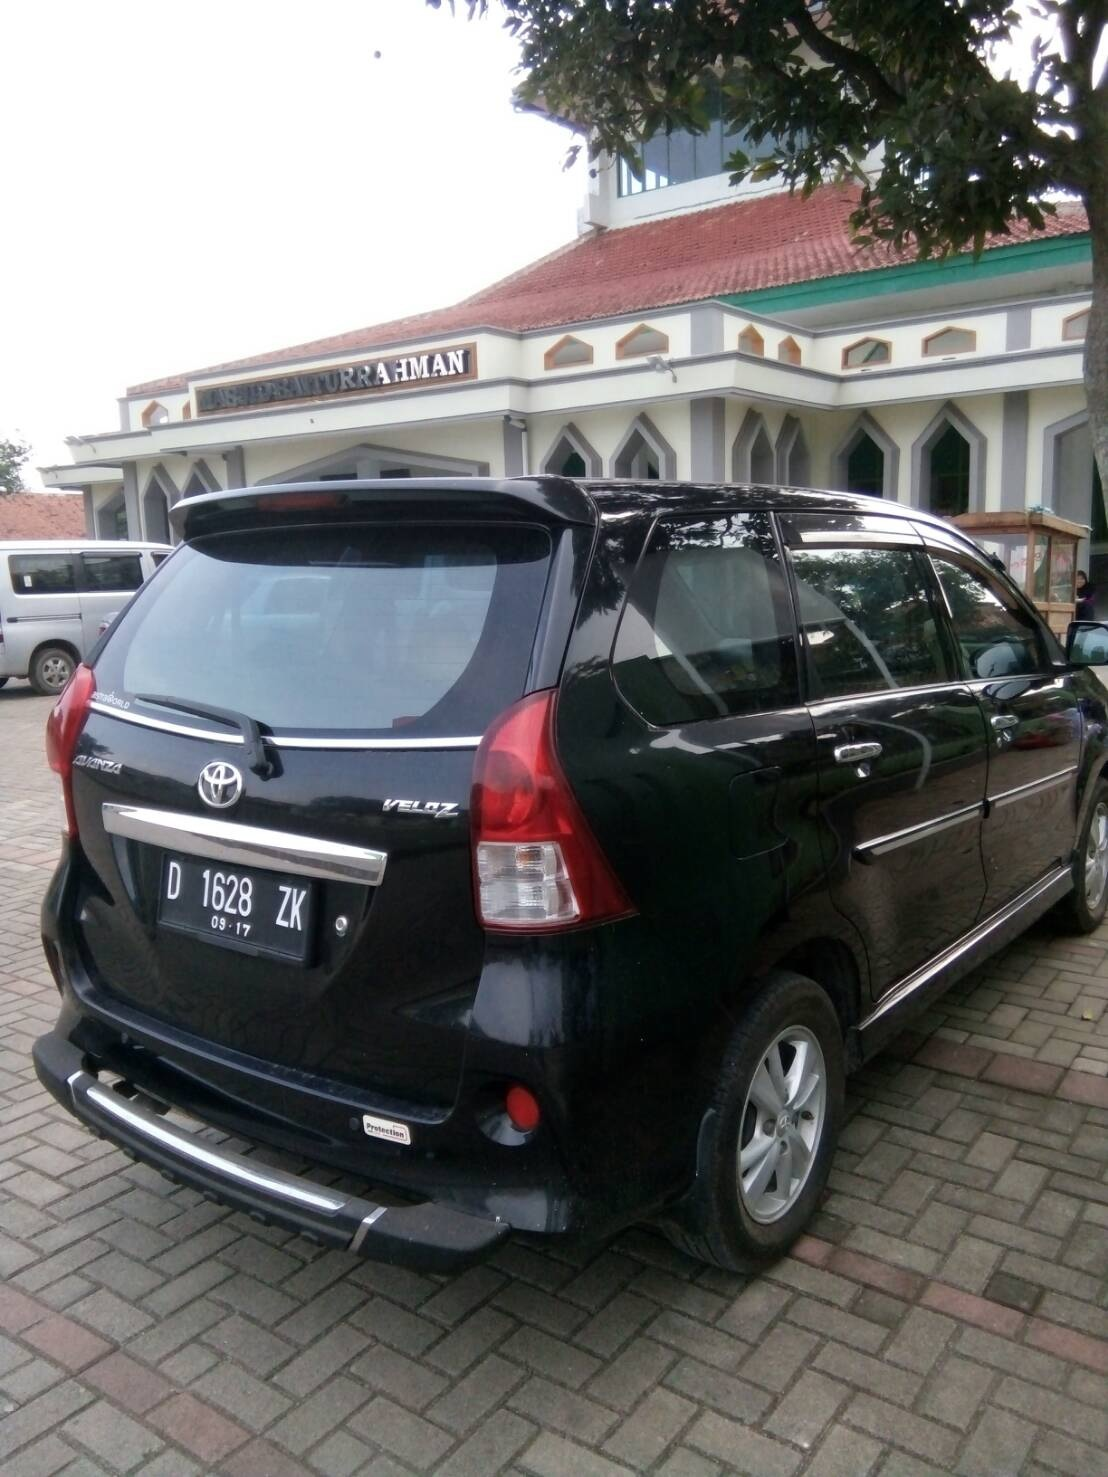 Cara Setting Alarm Grand New Avanza All Kijang Innova 2013 Wts Jual Mobil Veloz 2012 M T Hitam Metalik